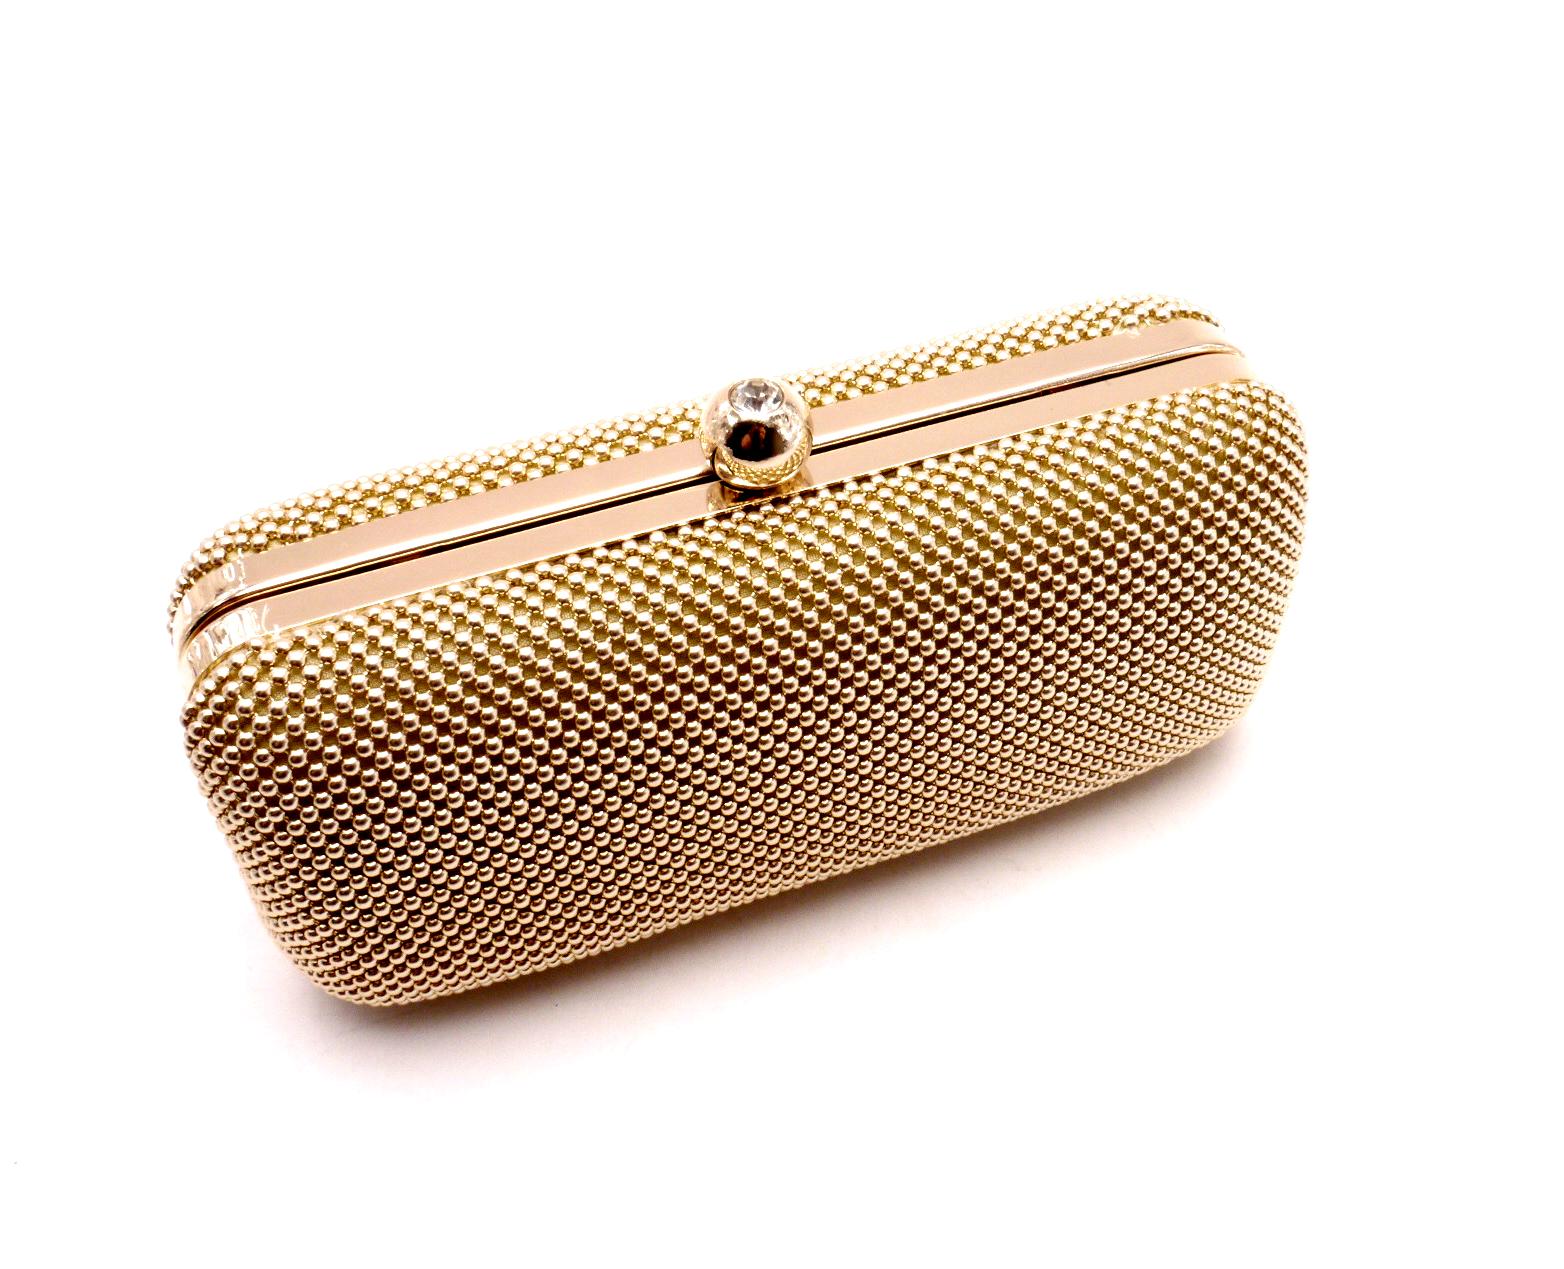 Borse Design Kabelka 15-23 GOLD